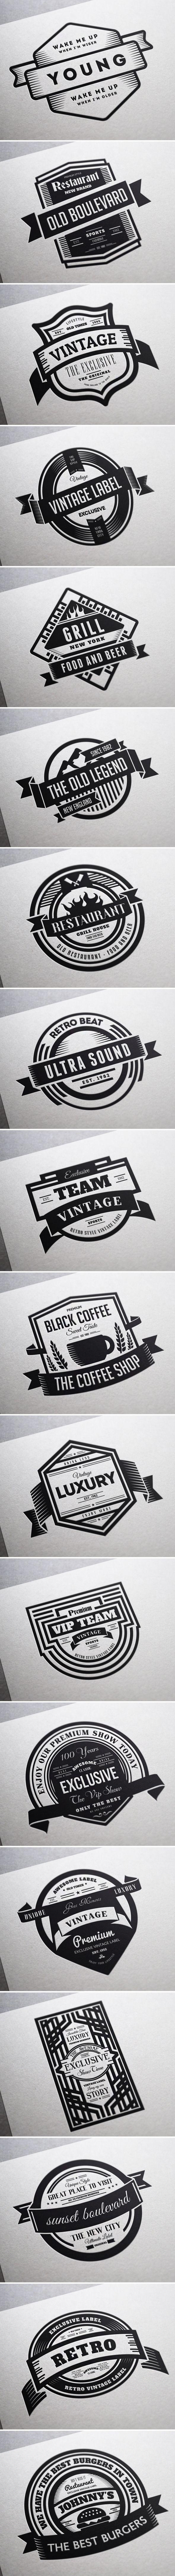 18 Vintage Labels & Badges / Logos / Insignias on Behance